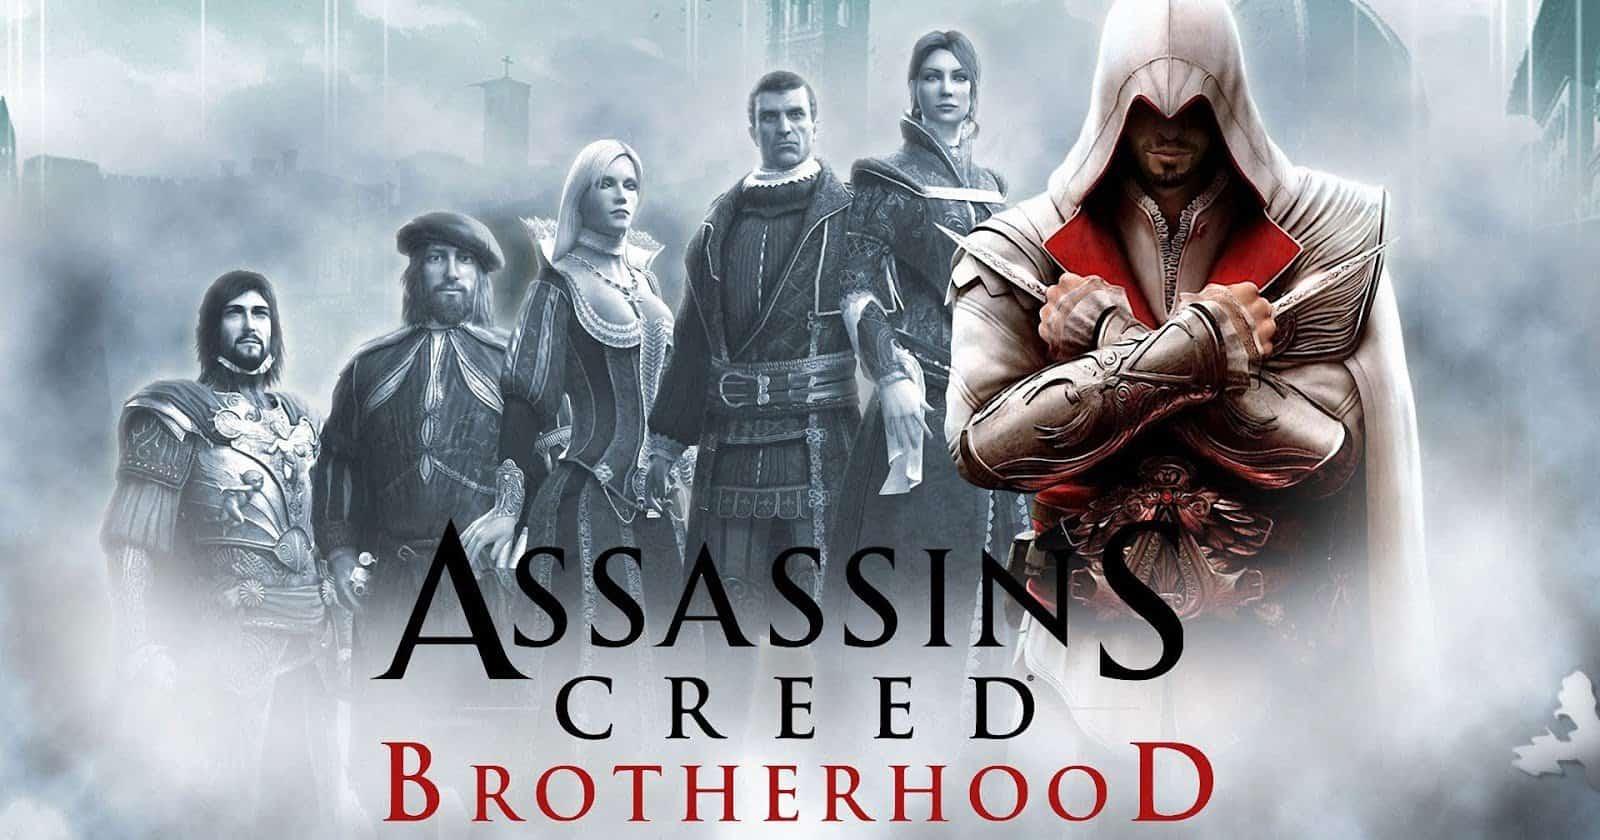 Assassin Creed Brotherhood iOS/APK Version Full Game Free Download